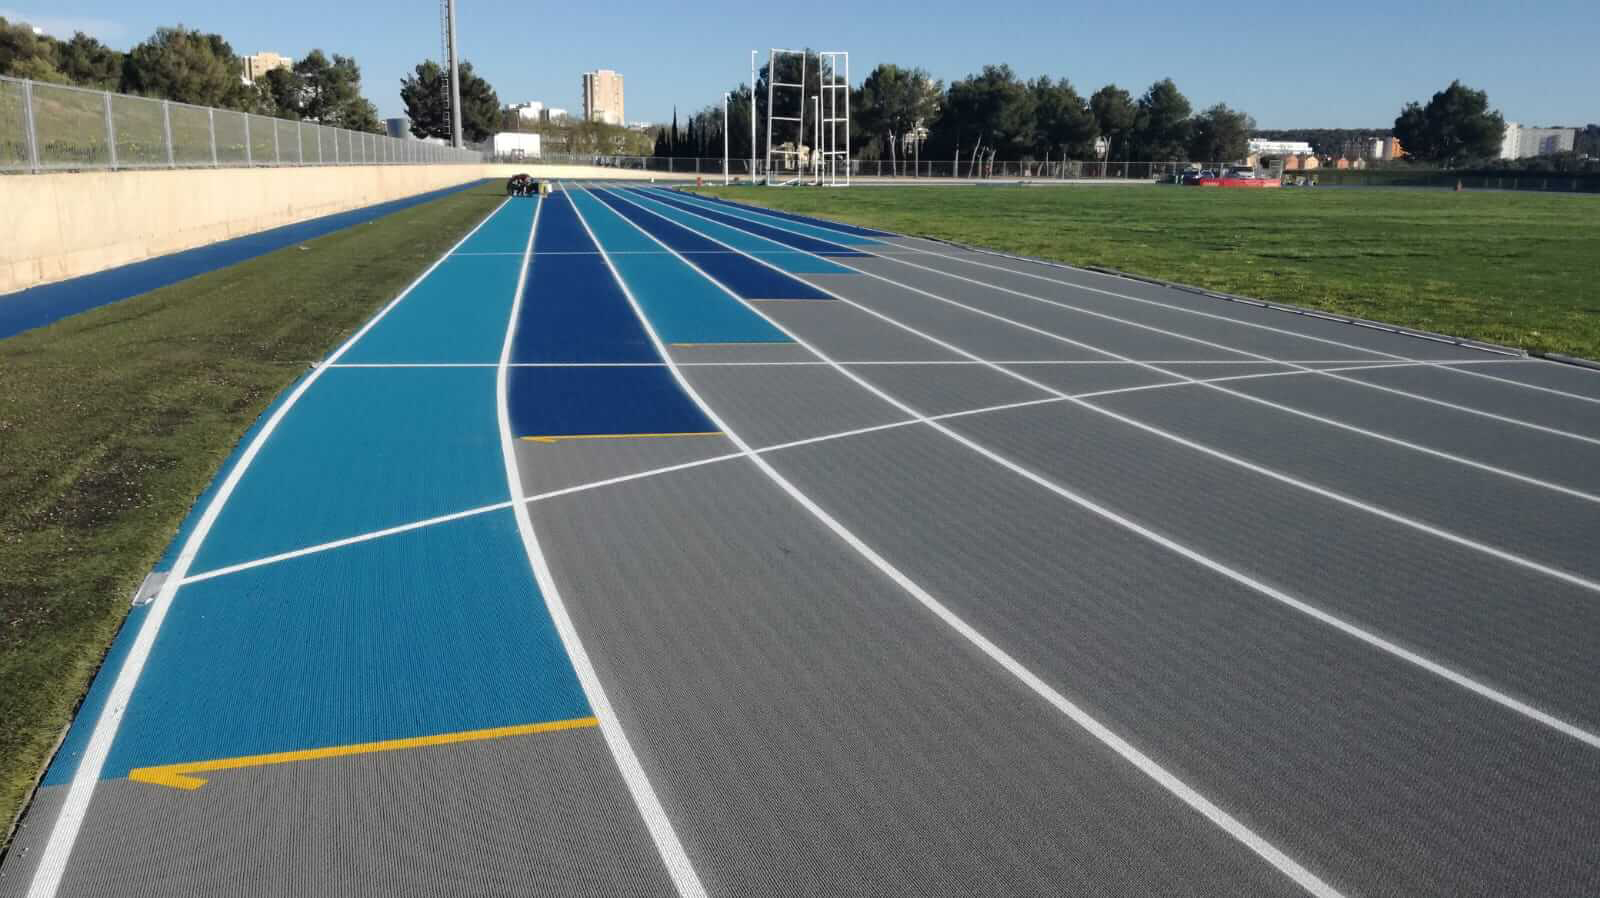 relay zone athletics track magaluf, zona de relevos pista de atletismo magaluf, zona de relleus pista d'atletisme Magaluf , Entrena atletismo en Mallorca , Athletics track in Mallorca